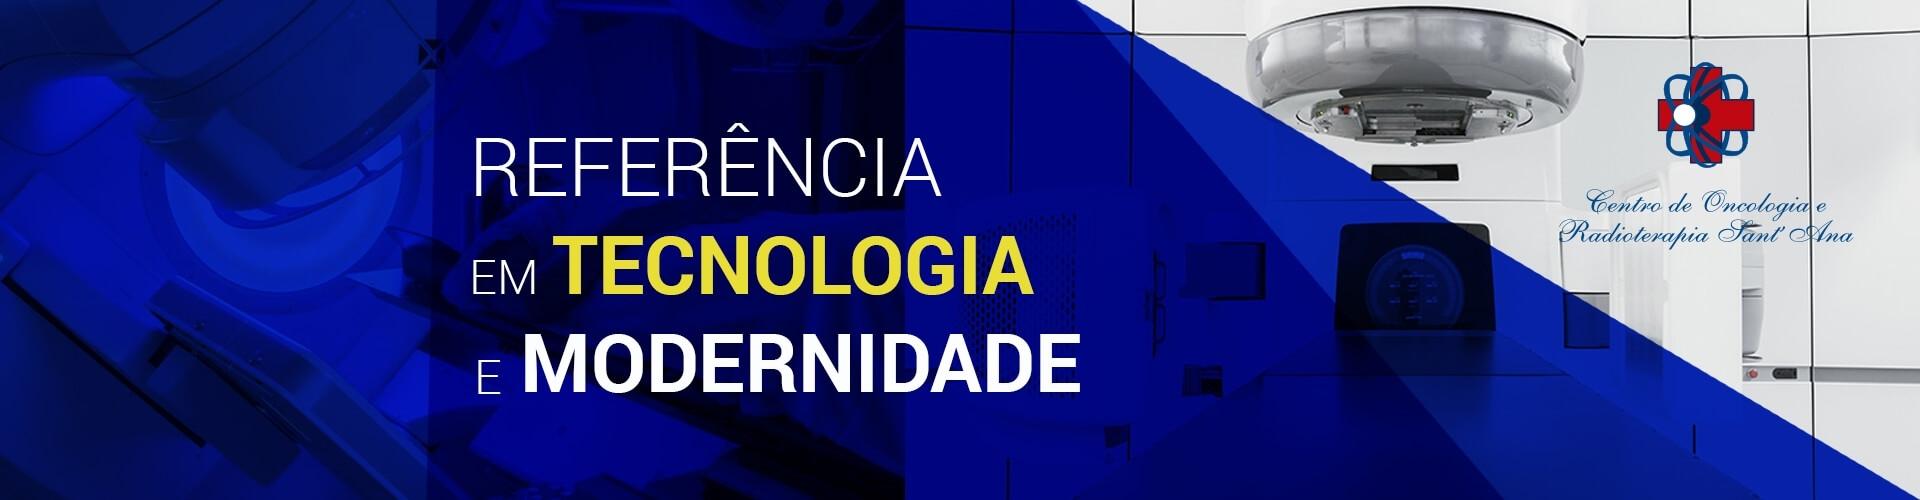 Banner Desk 1 - Oncosantana